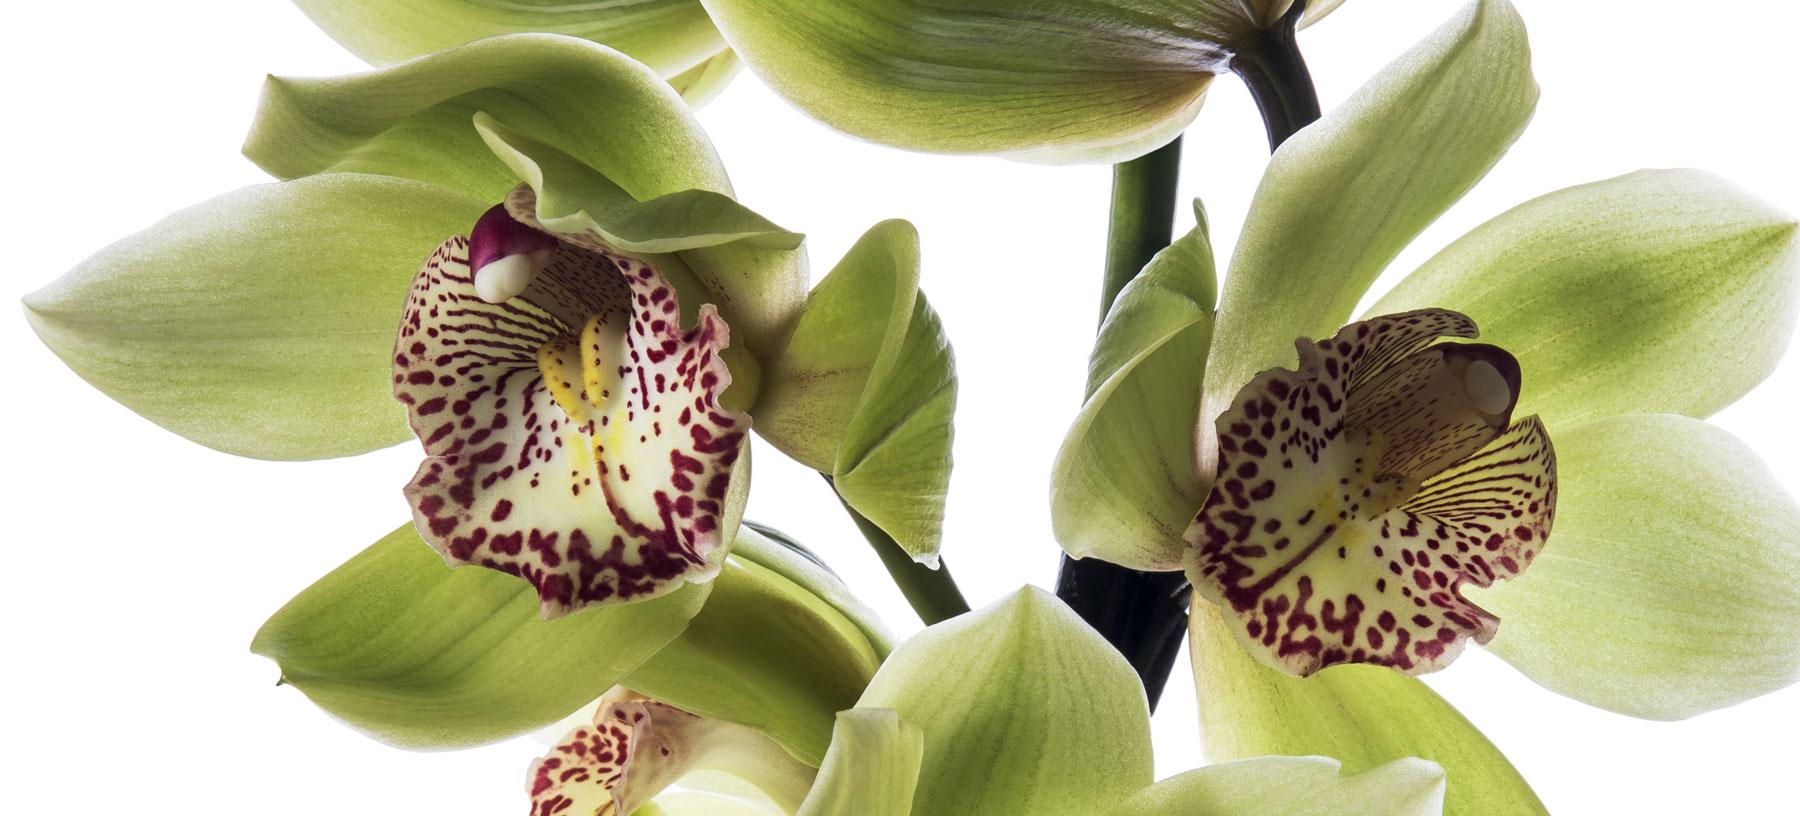 Cymbidium Cut Orchids